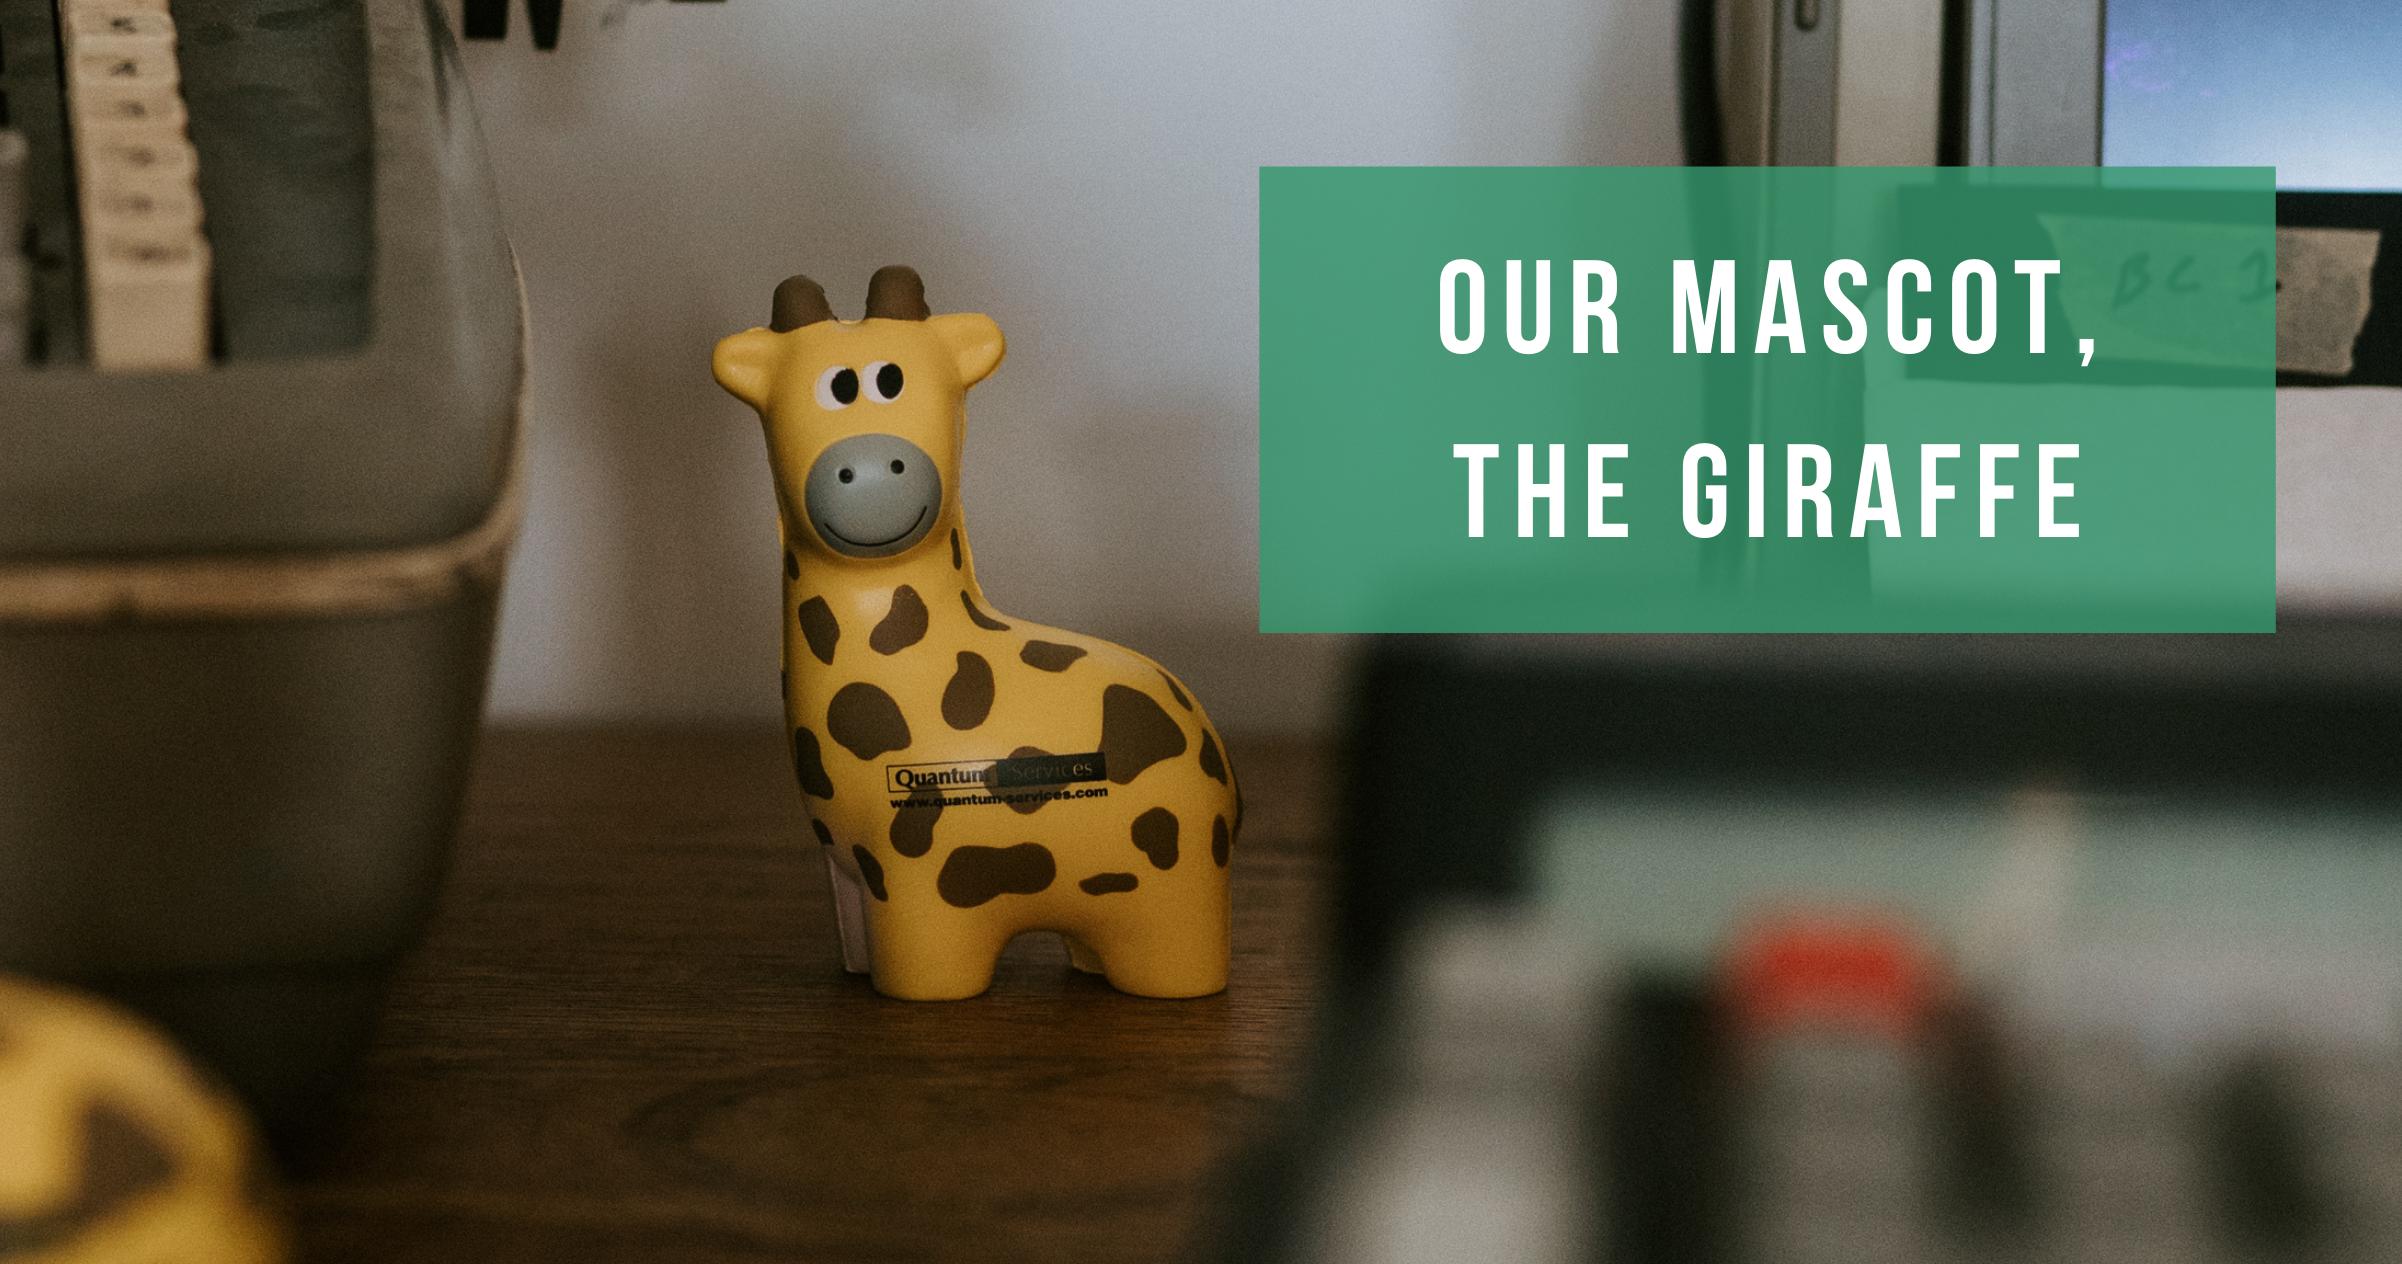 our mascot the giraffe